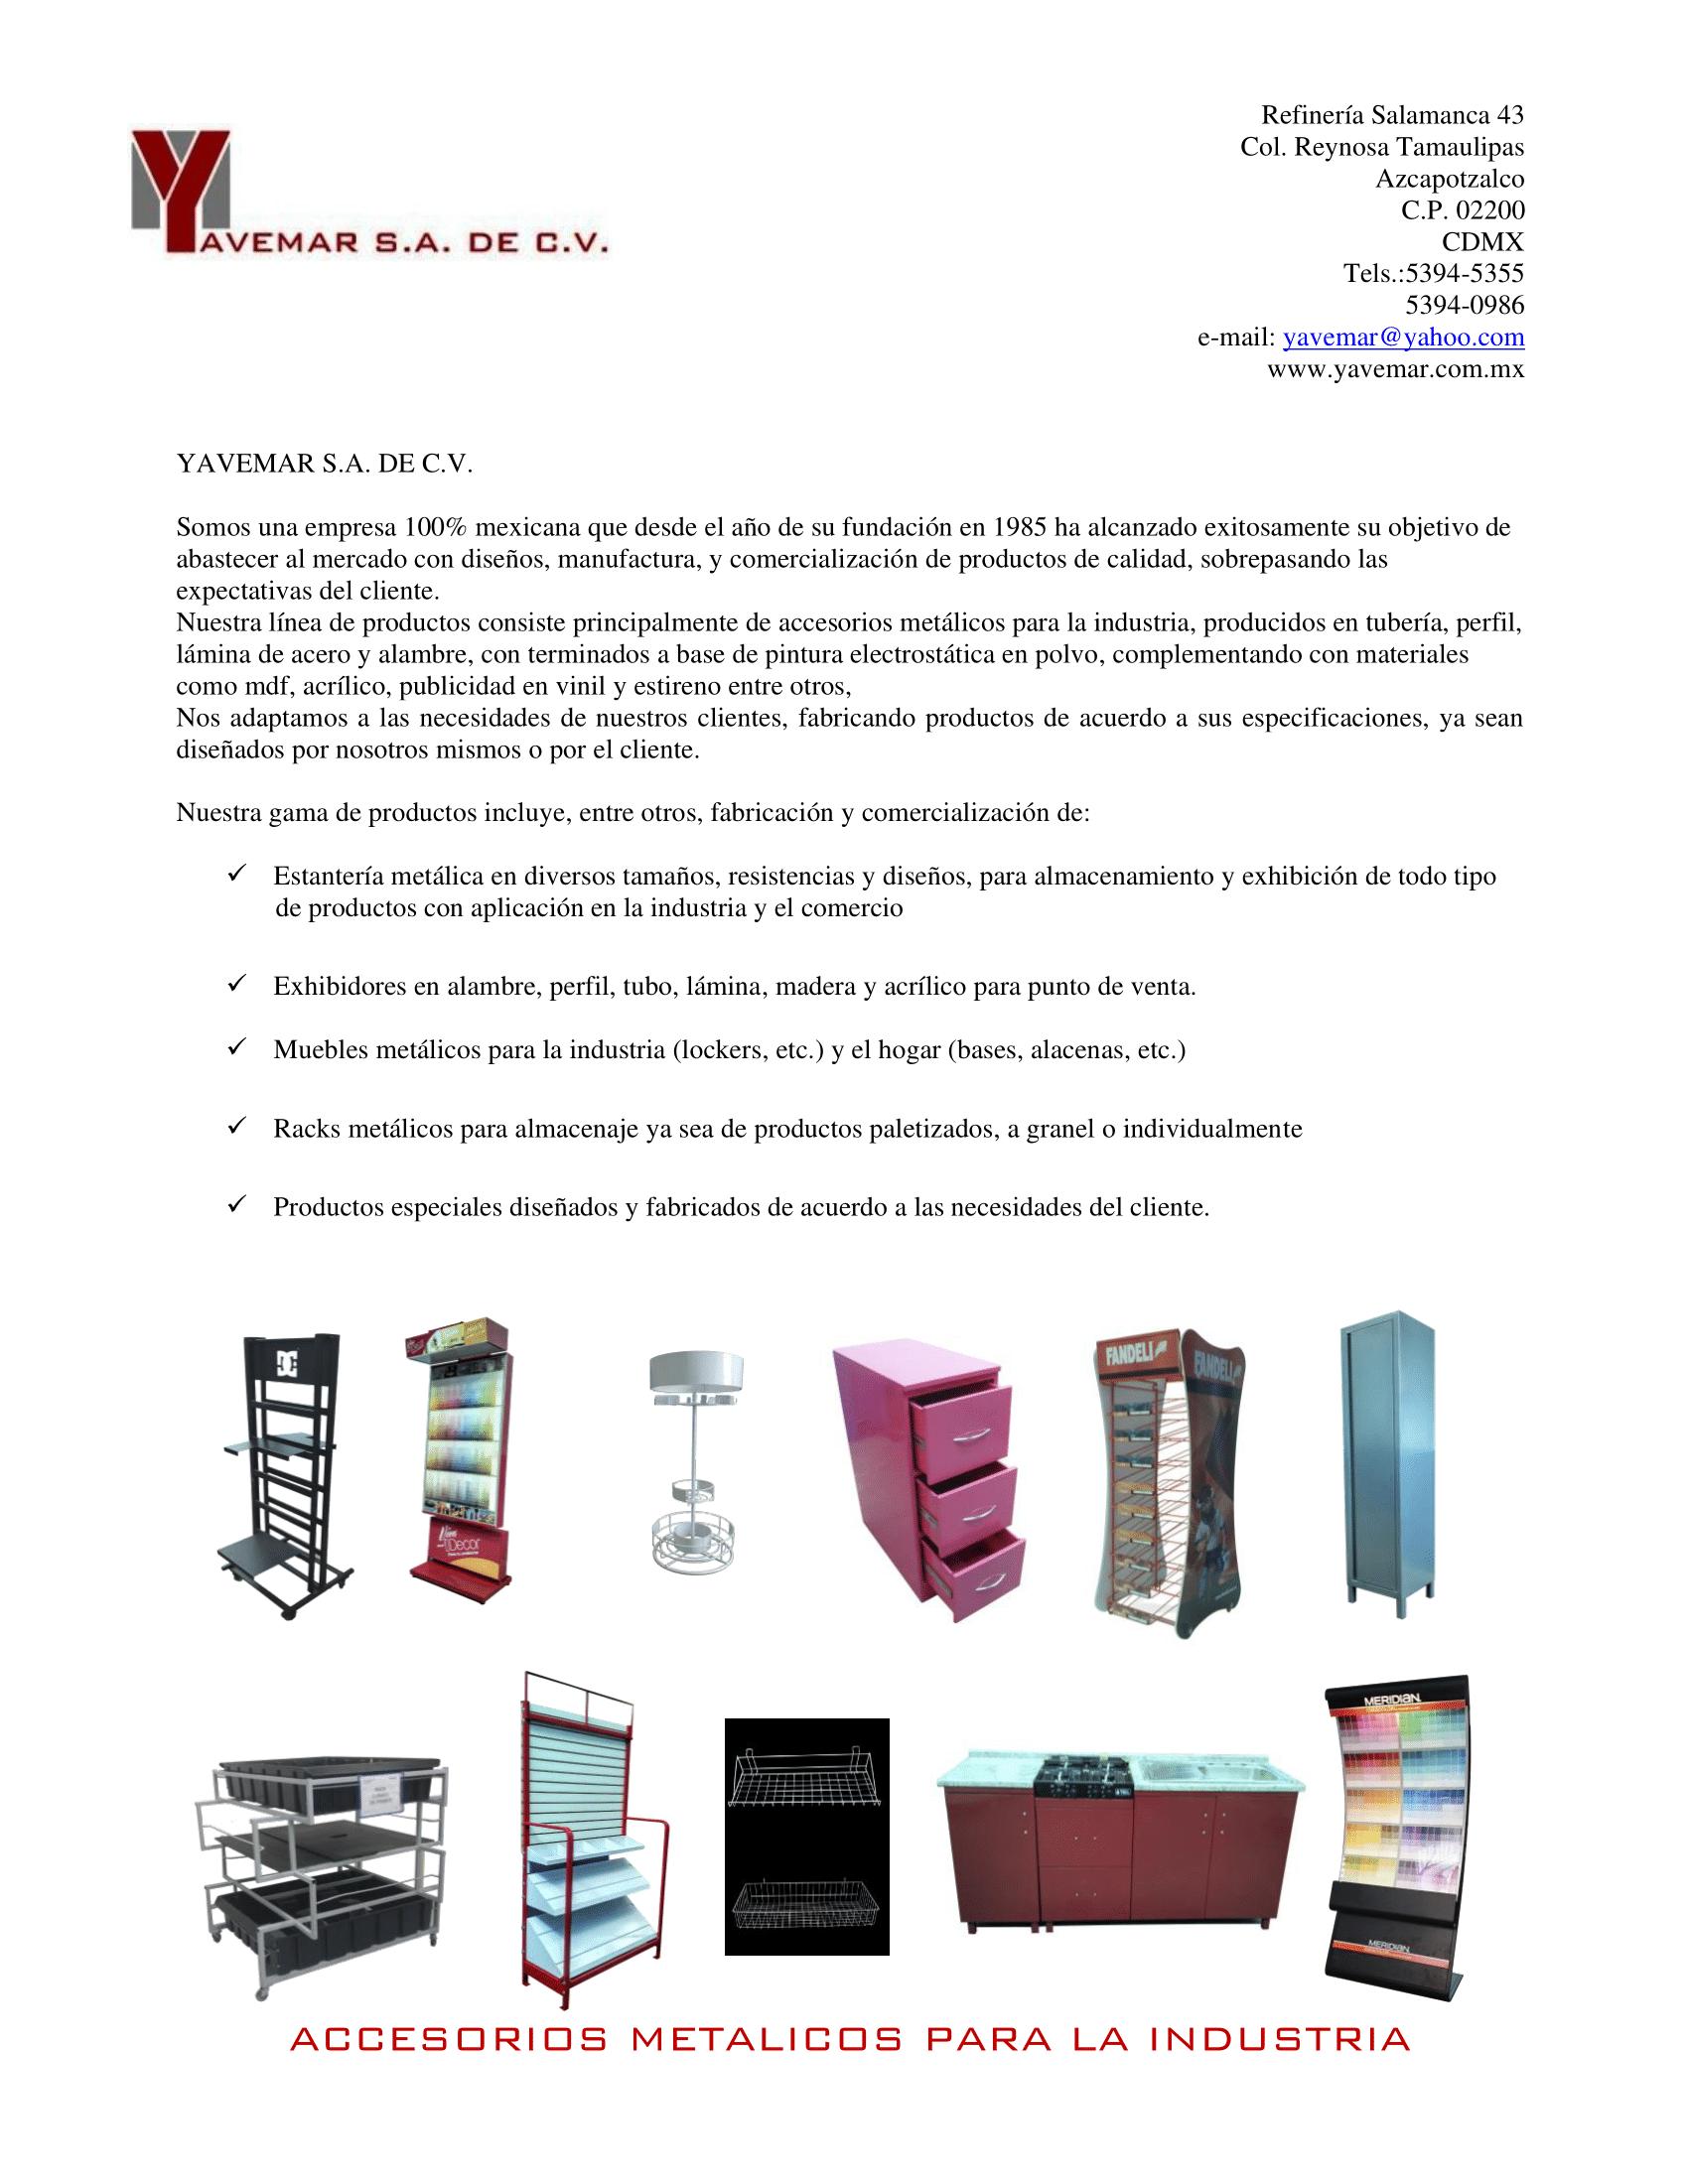 CARTA PRESENTACIÓN- YAVEMAR-1